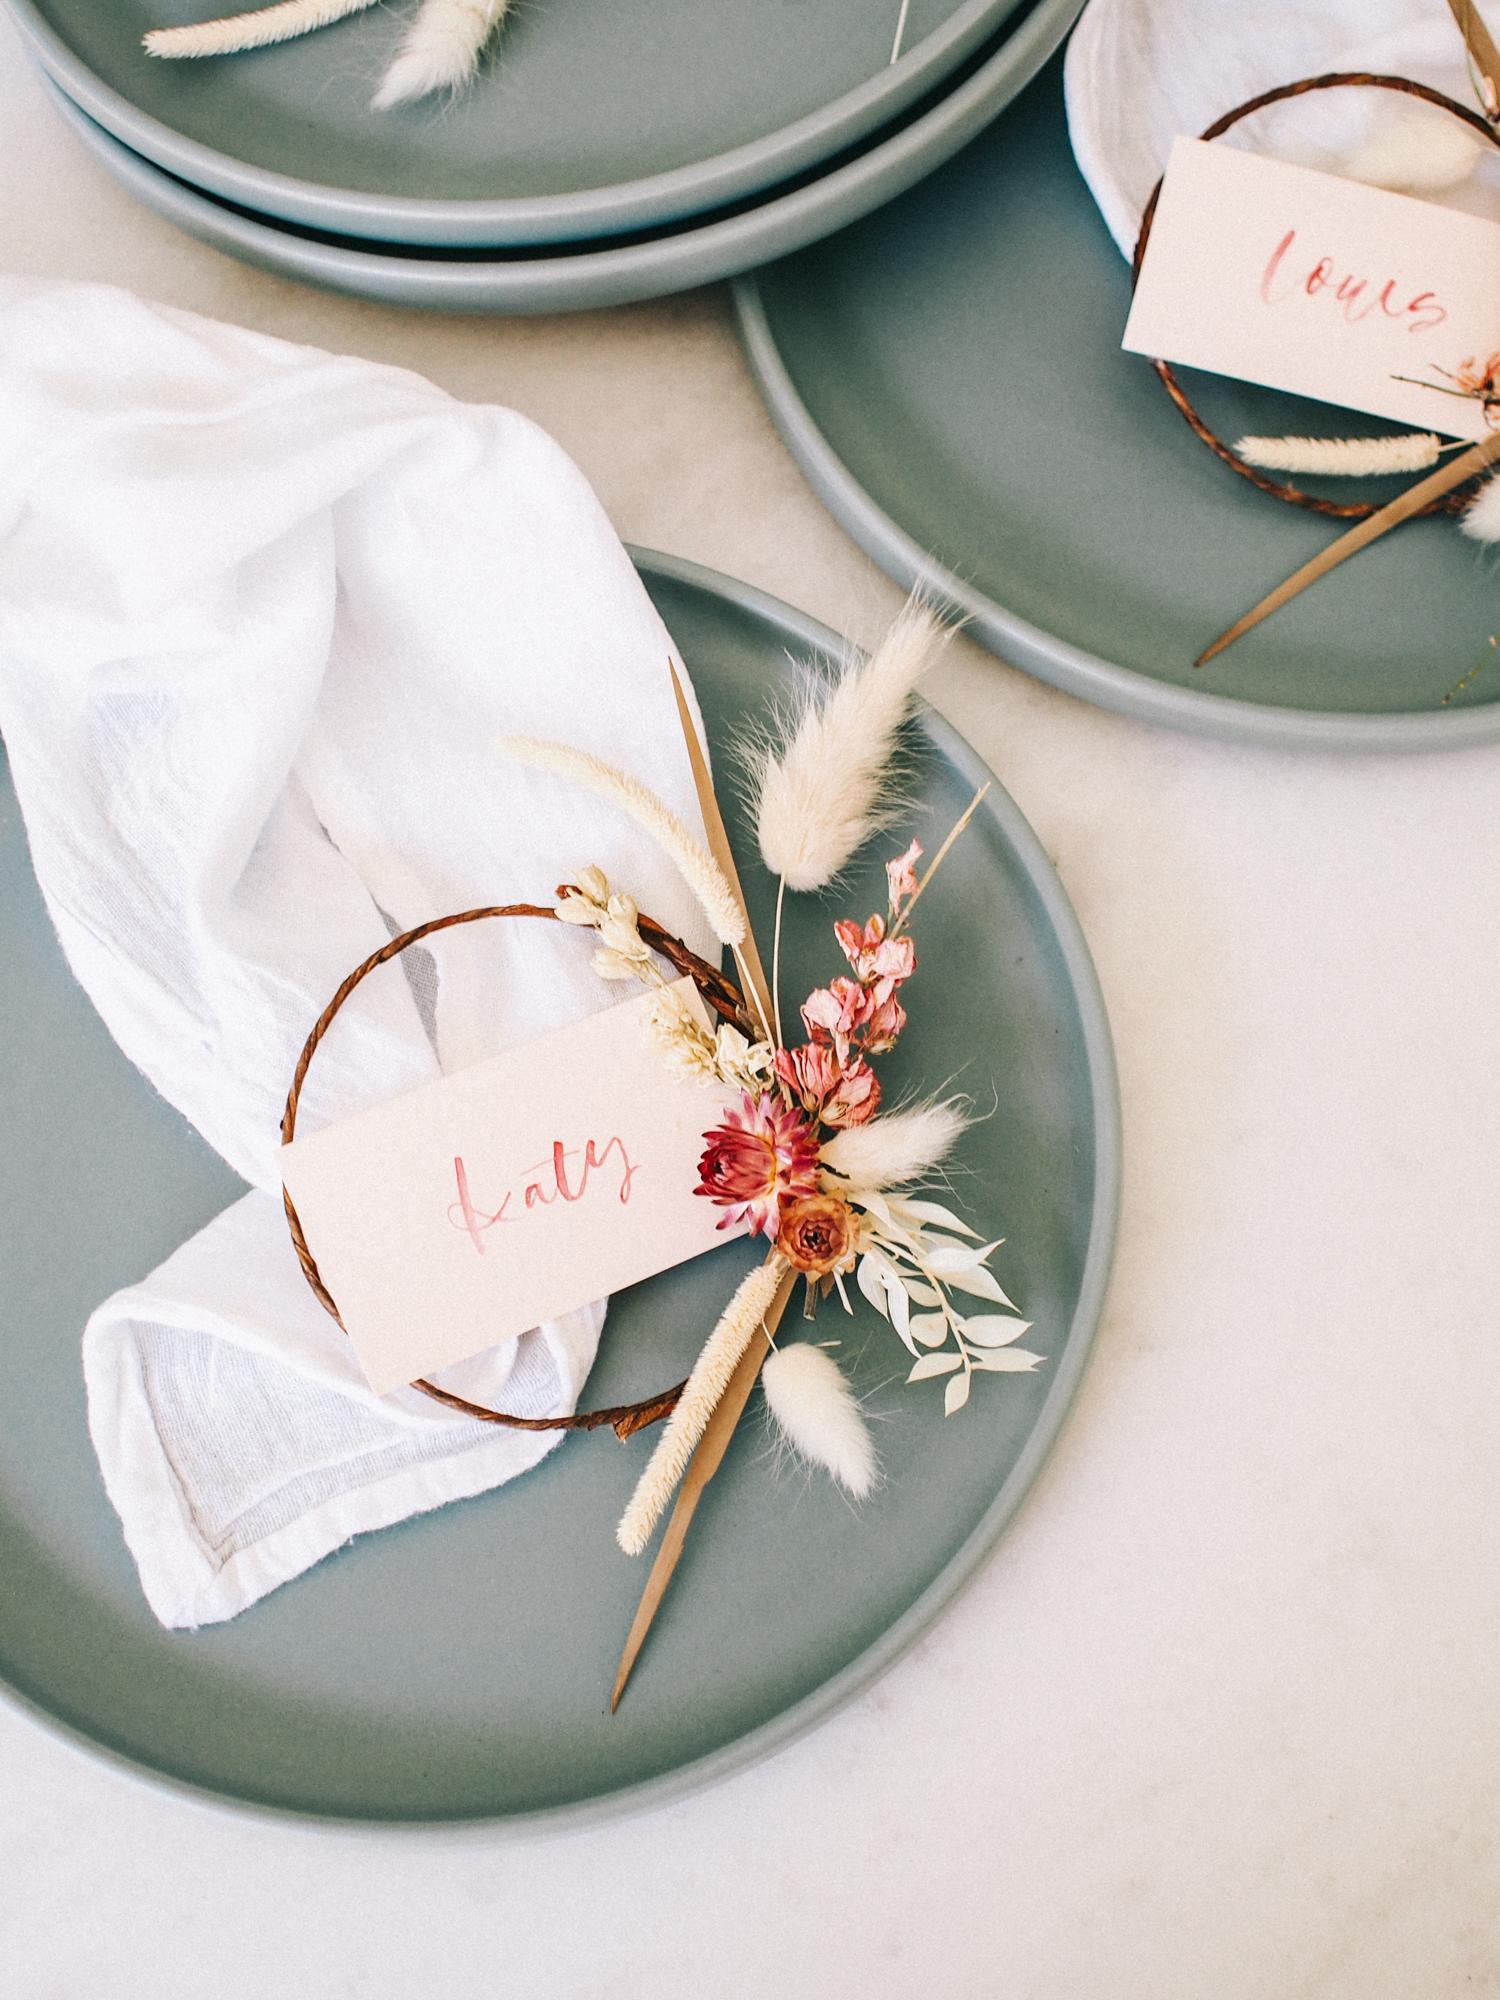 Make Easy Floral Wreath Place Cards | A Fabulous Fete